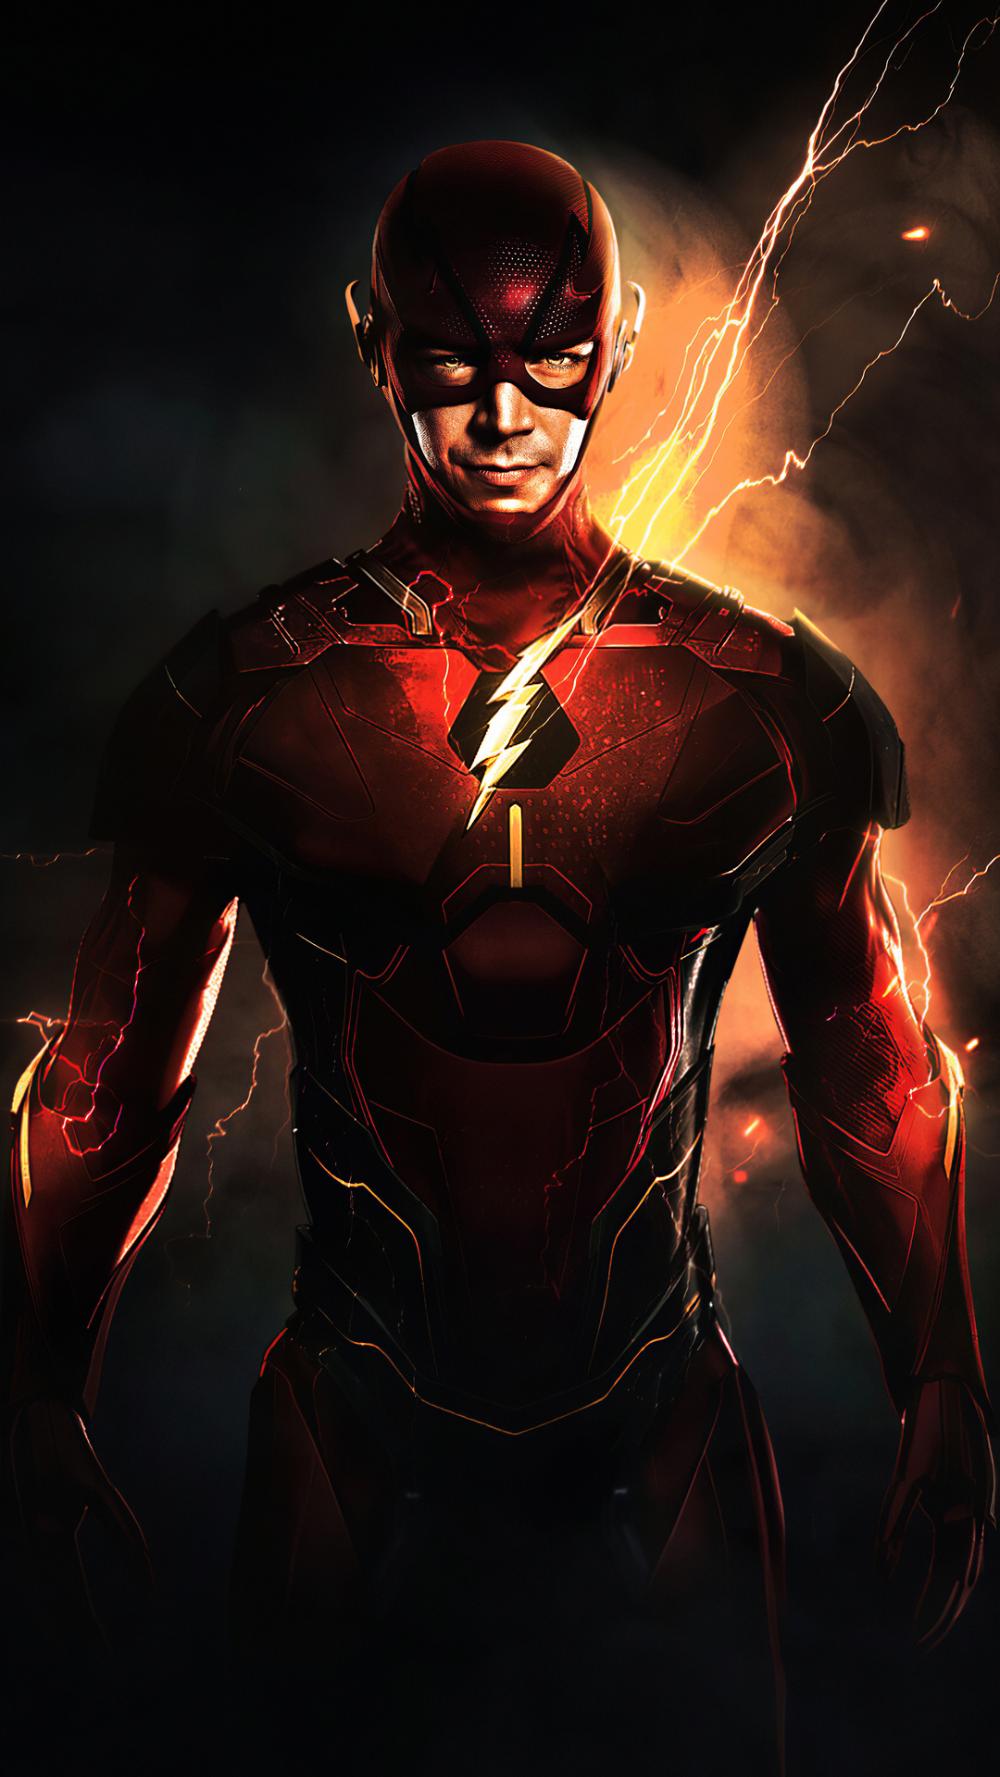 Flash Barry Allen 4k In 1080x1920 Resolution Reverse Flash The Flash Flash Wallpaper